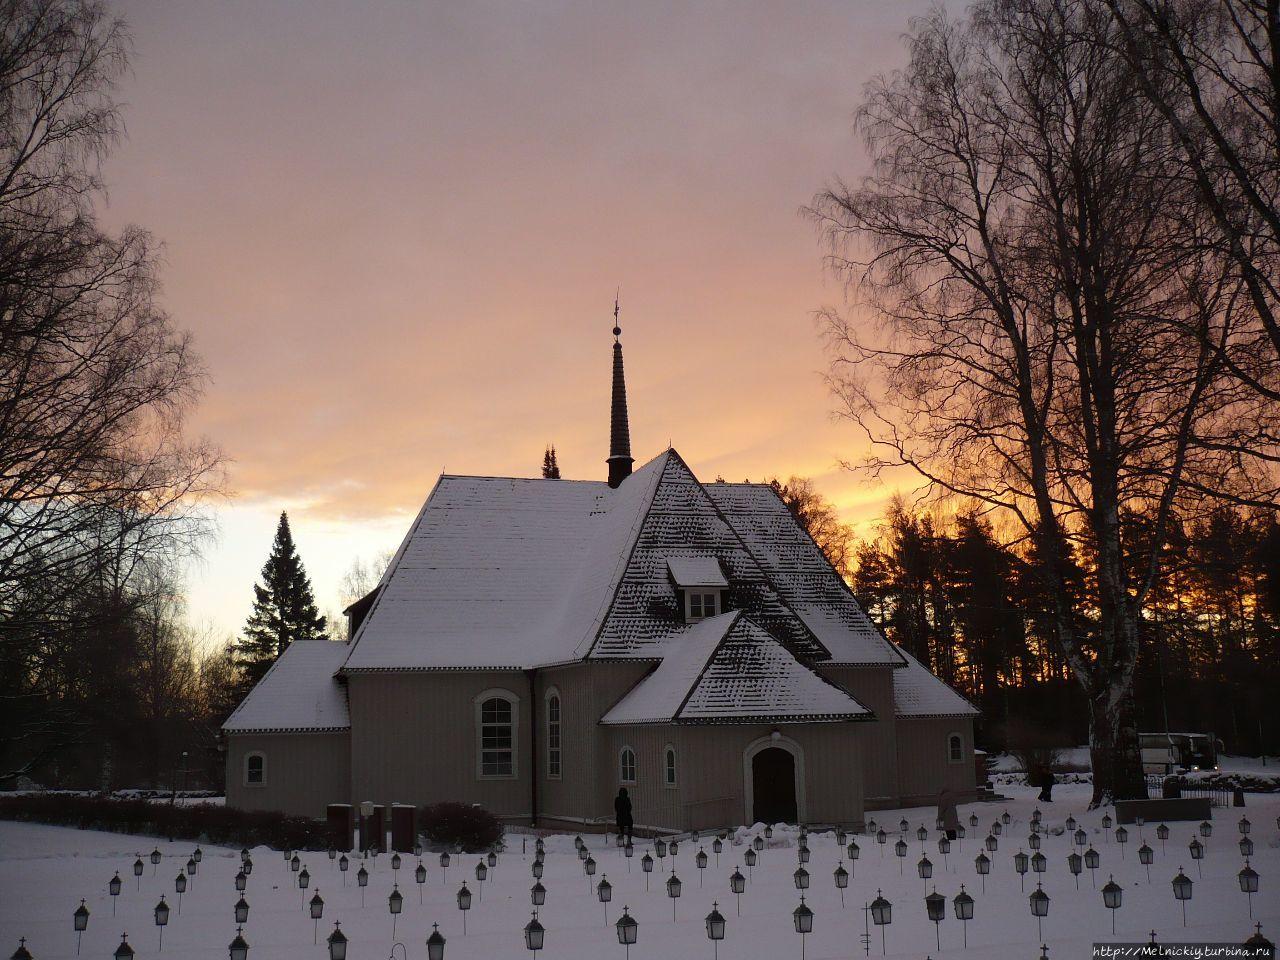 где захоронение хяме настола холлола финляндия фото все терялось